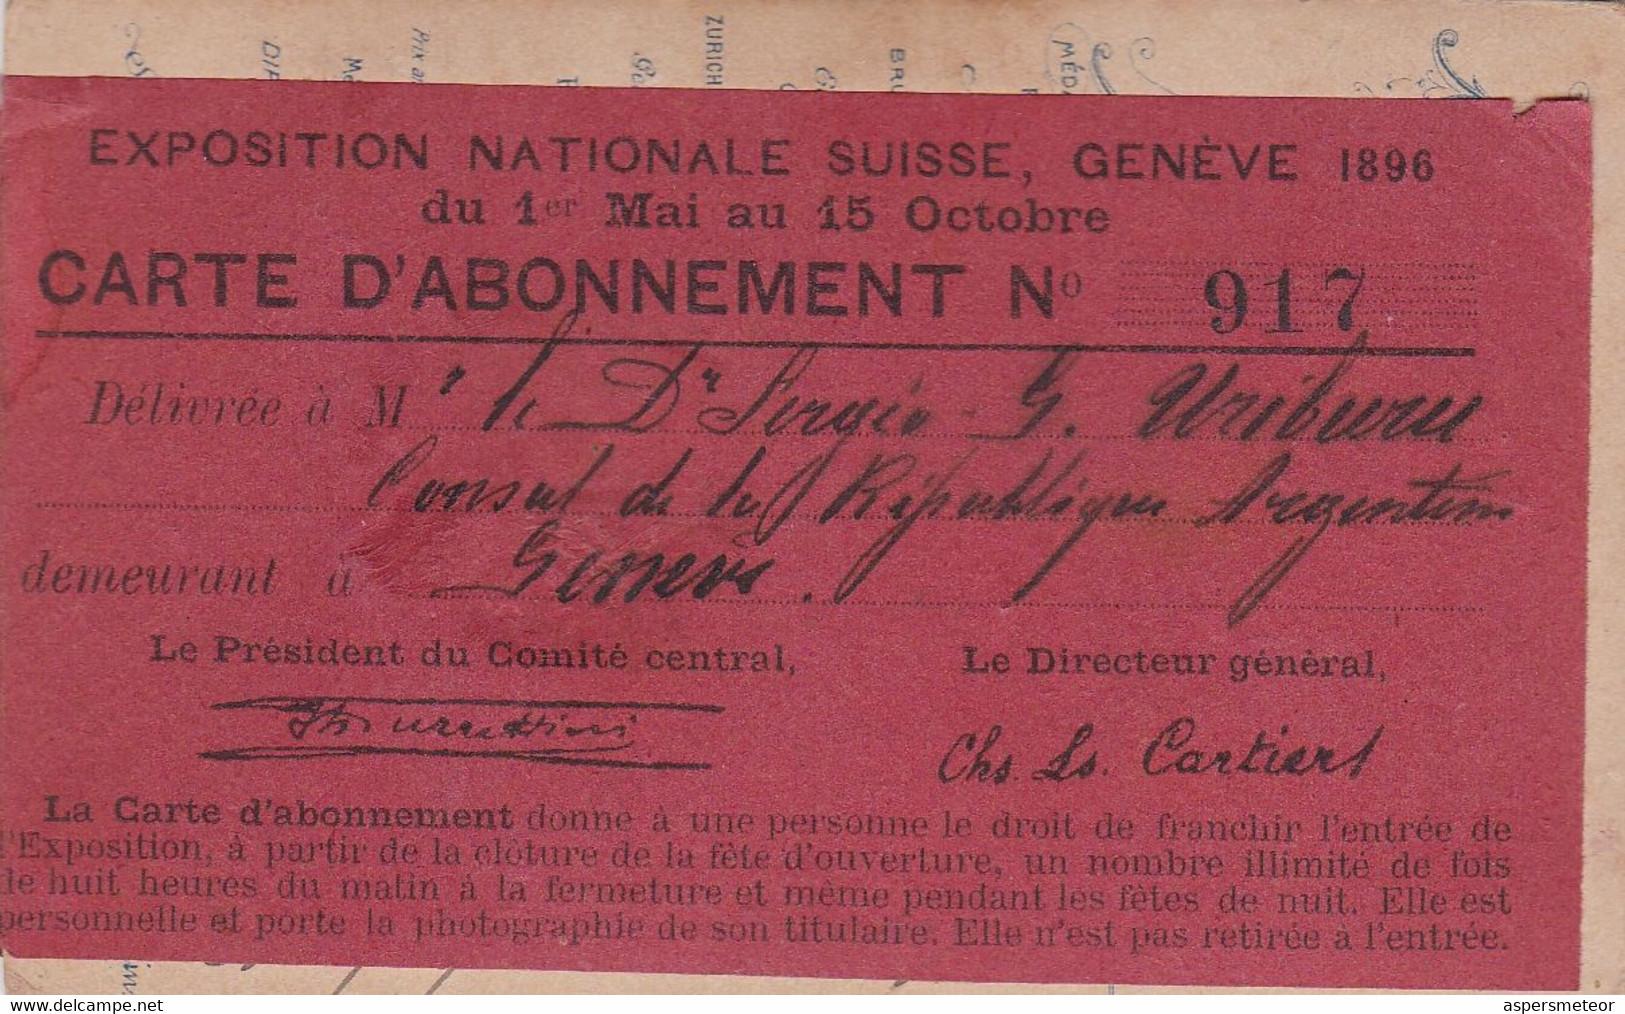 EXPOSITION NATIONALE SUISSE, GENEVE 1896. CARTE D'ABONNEMENT. SERGIO GARCIA URIBURU, CONSUL DE ARGENTINA. -LILHU - Tickets - Vouchers